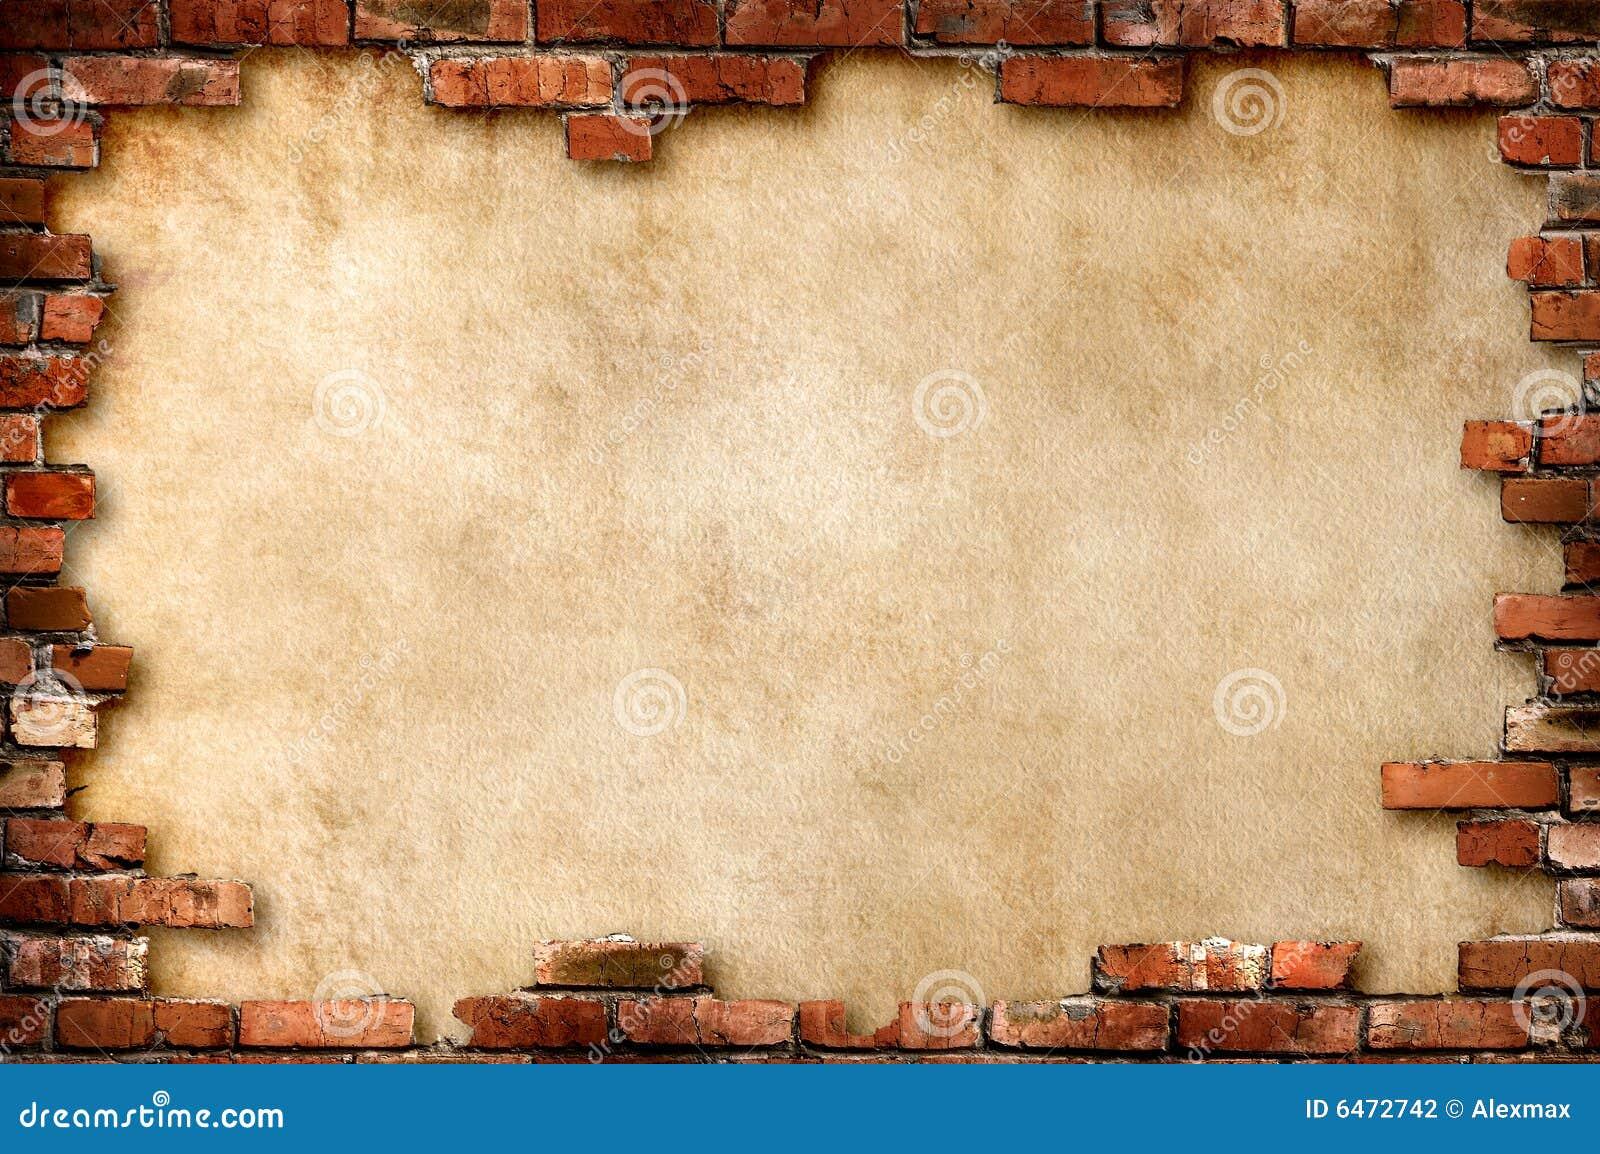 Brick Wall Grungy Frame Stock Photo 6472742 - Megapixl